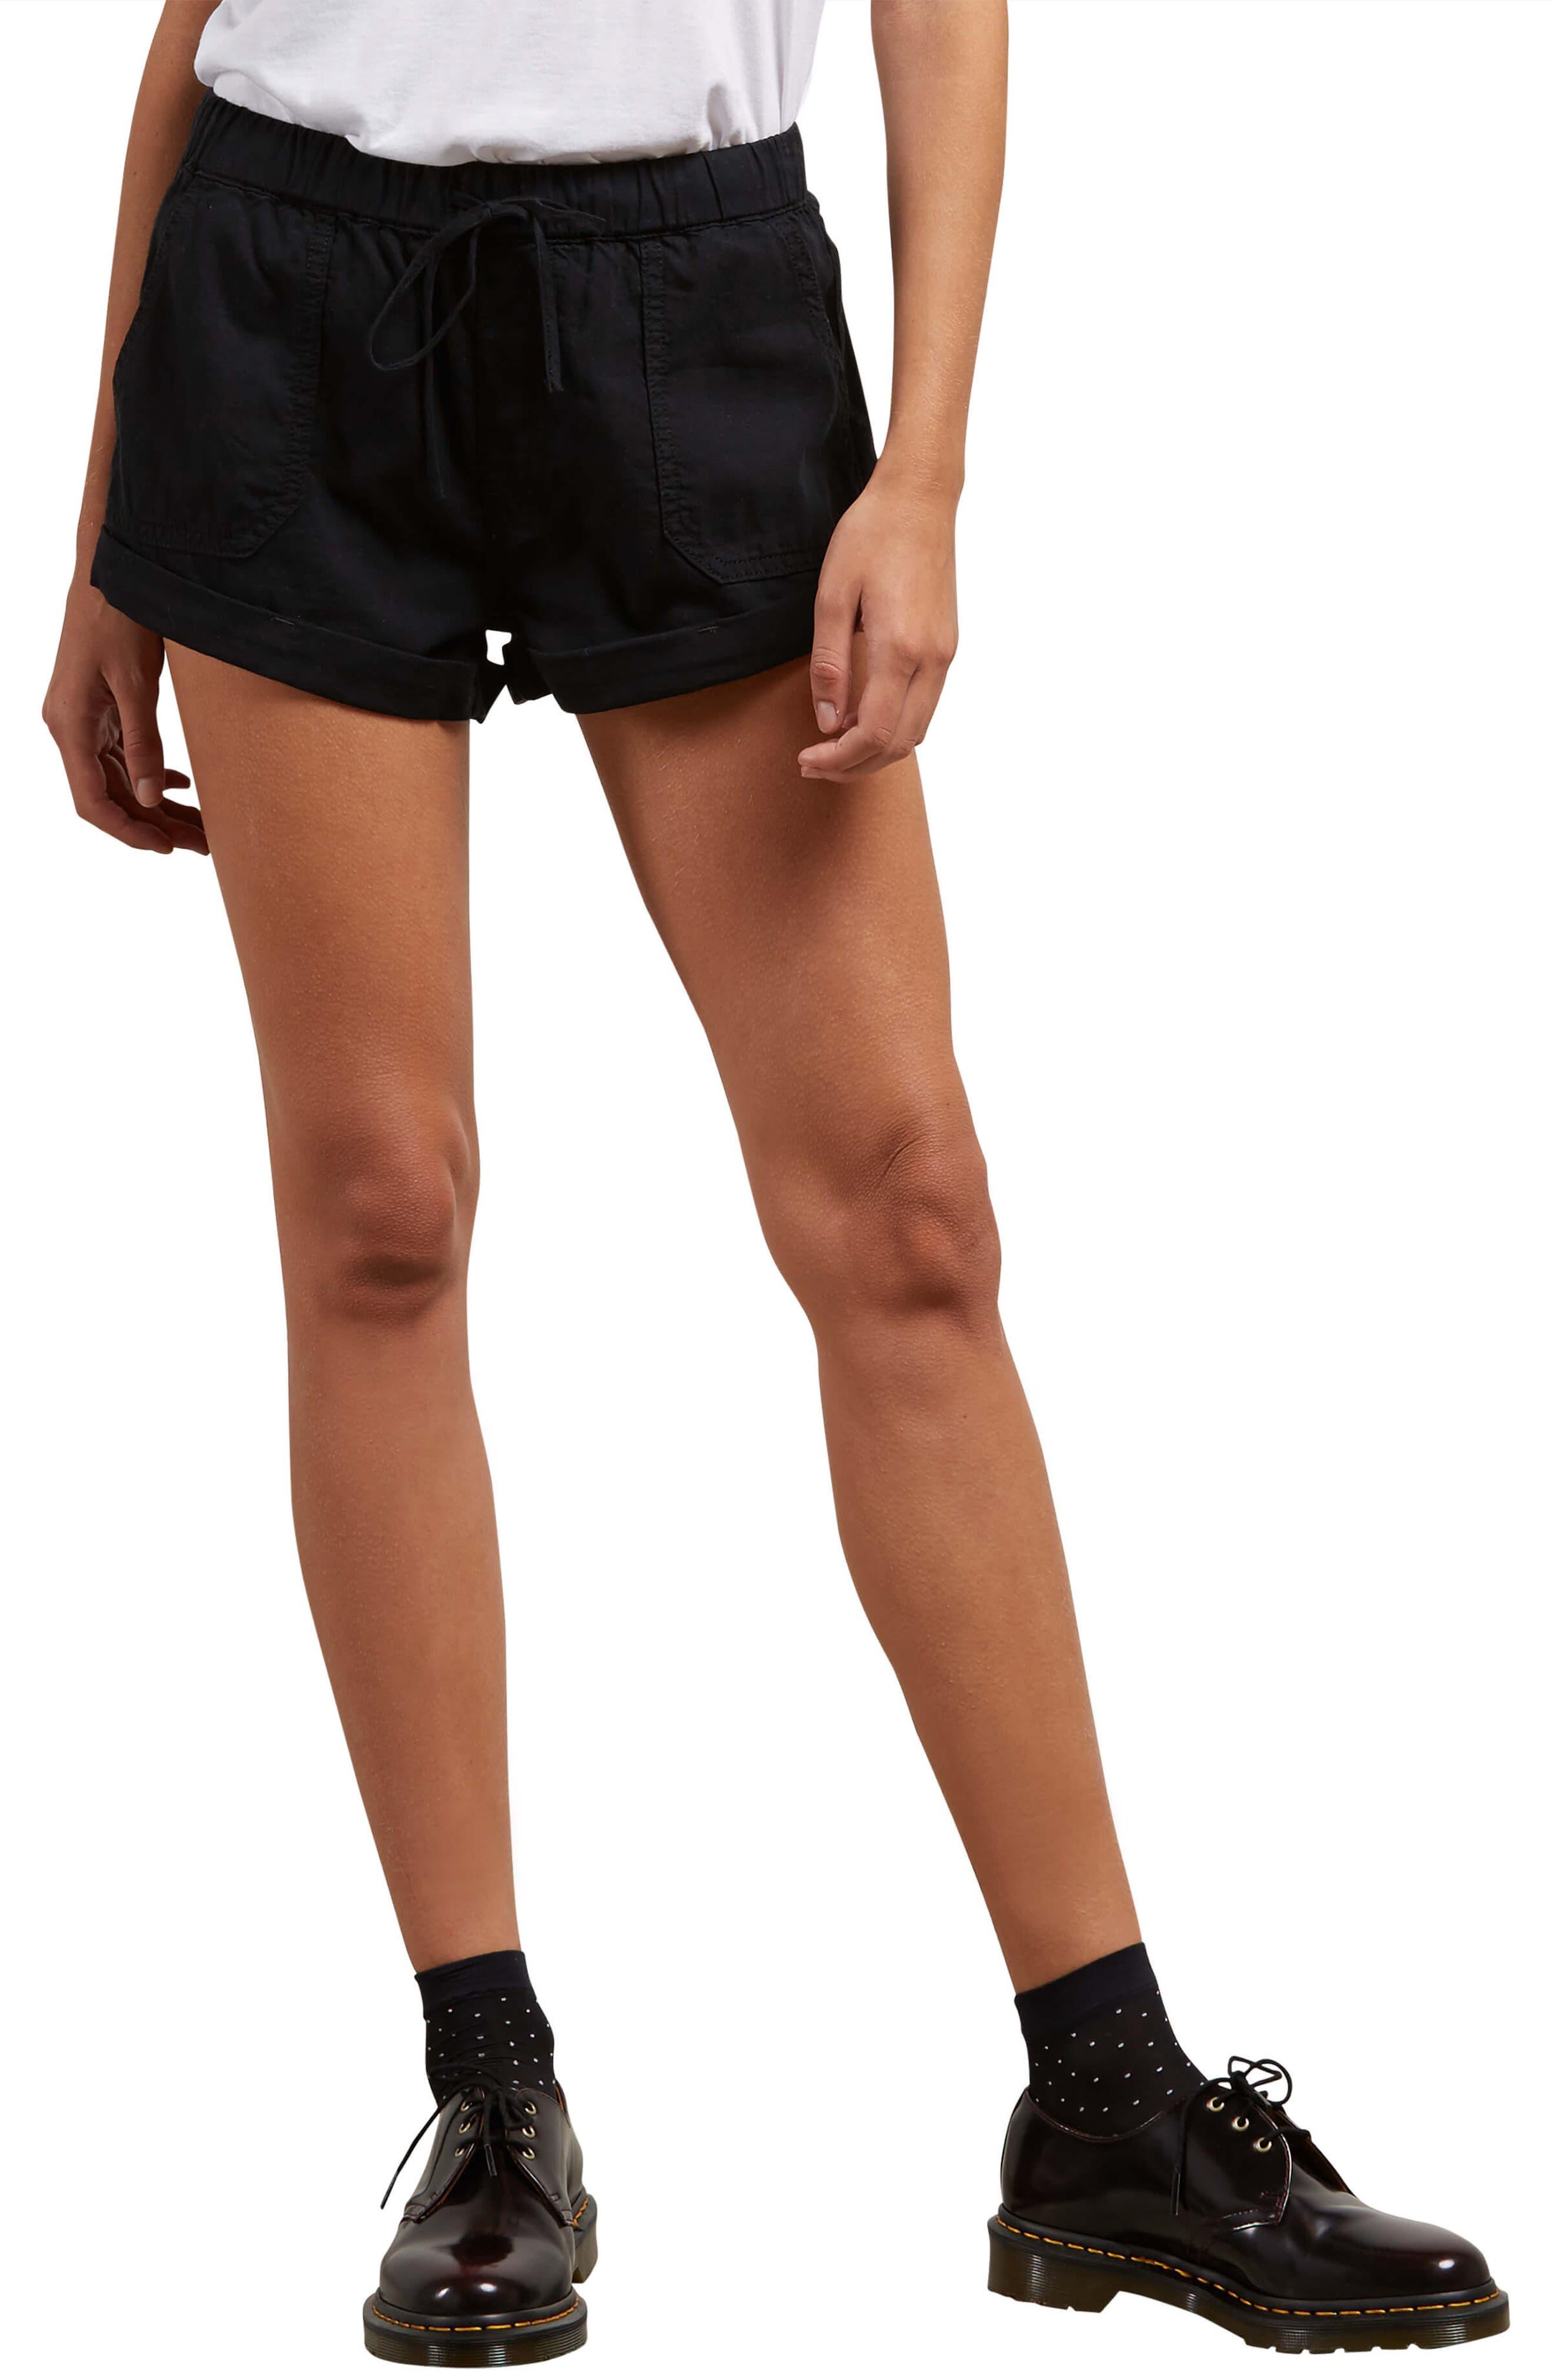 Sunday Strut Shorts,                         Main,                         color, Black